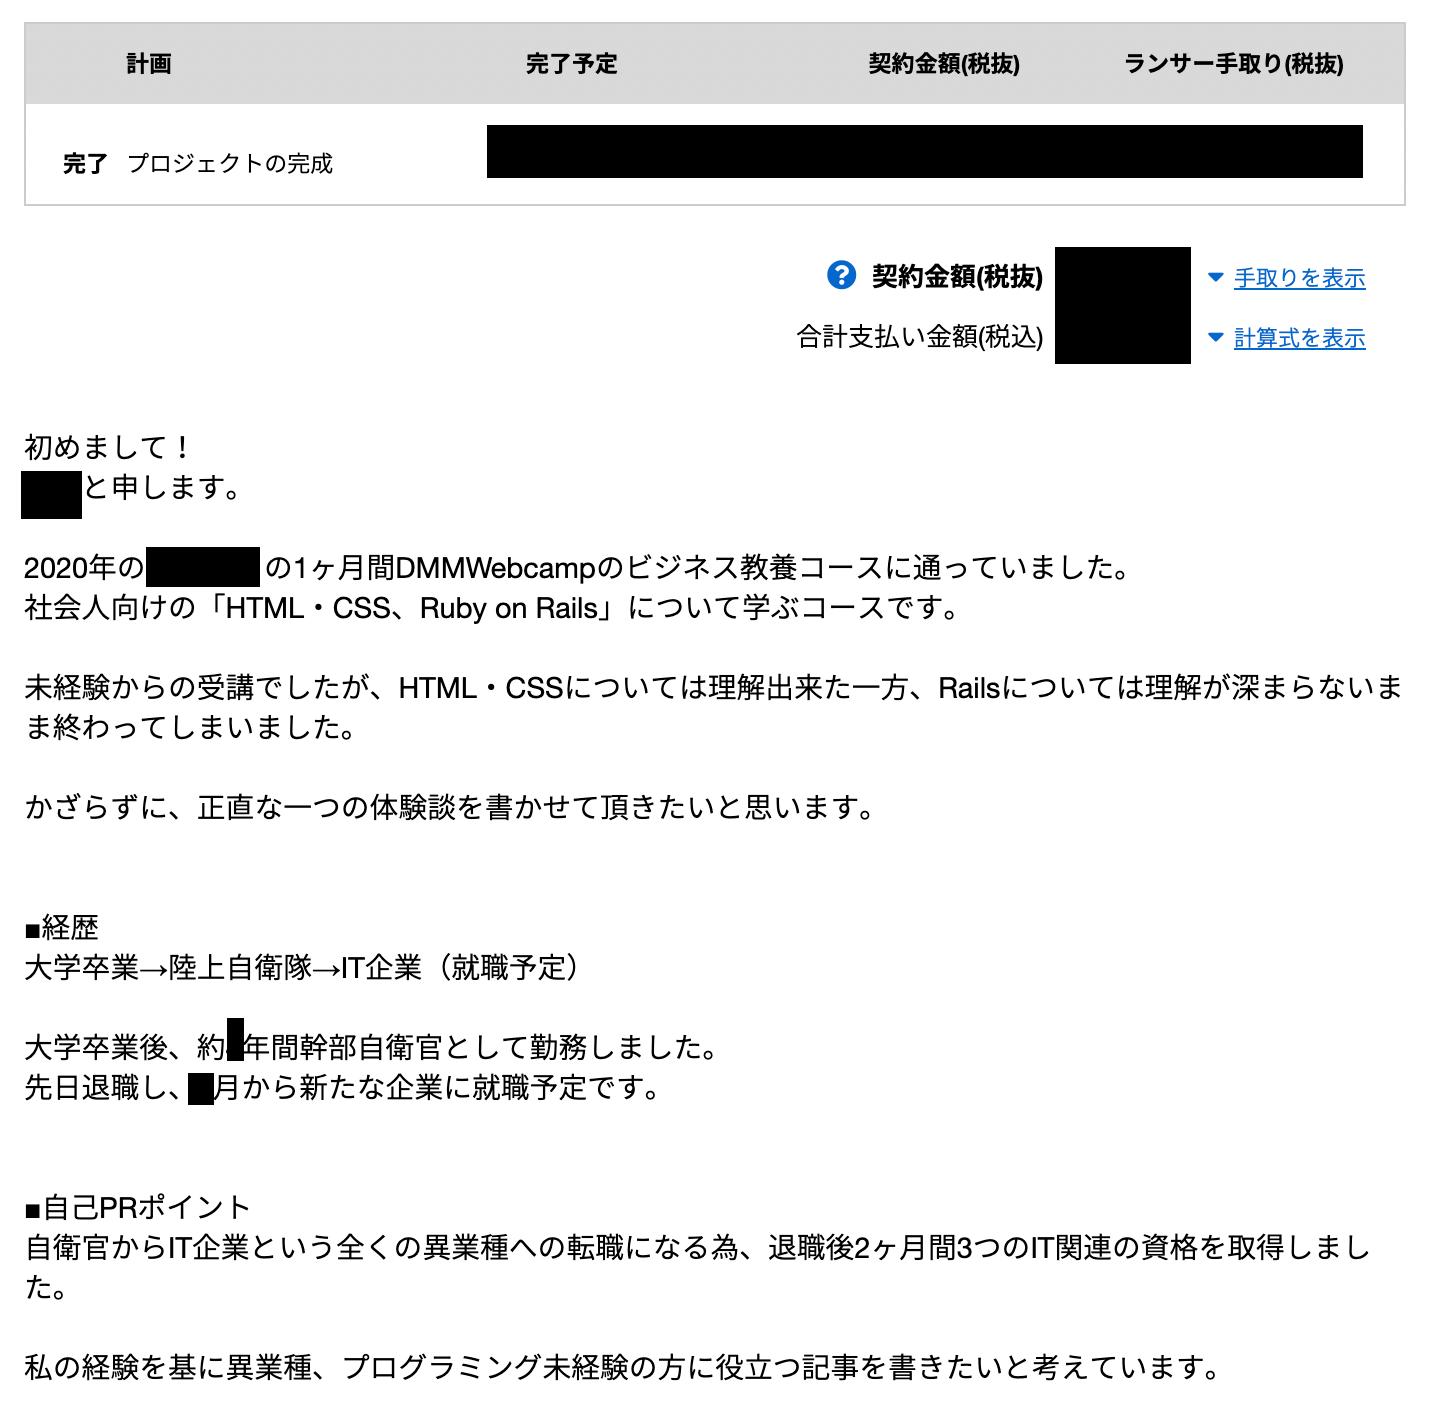 DMM WEBCAMPの記事寄稿